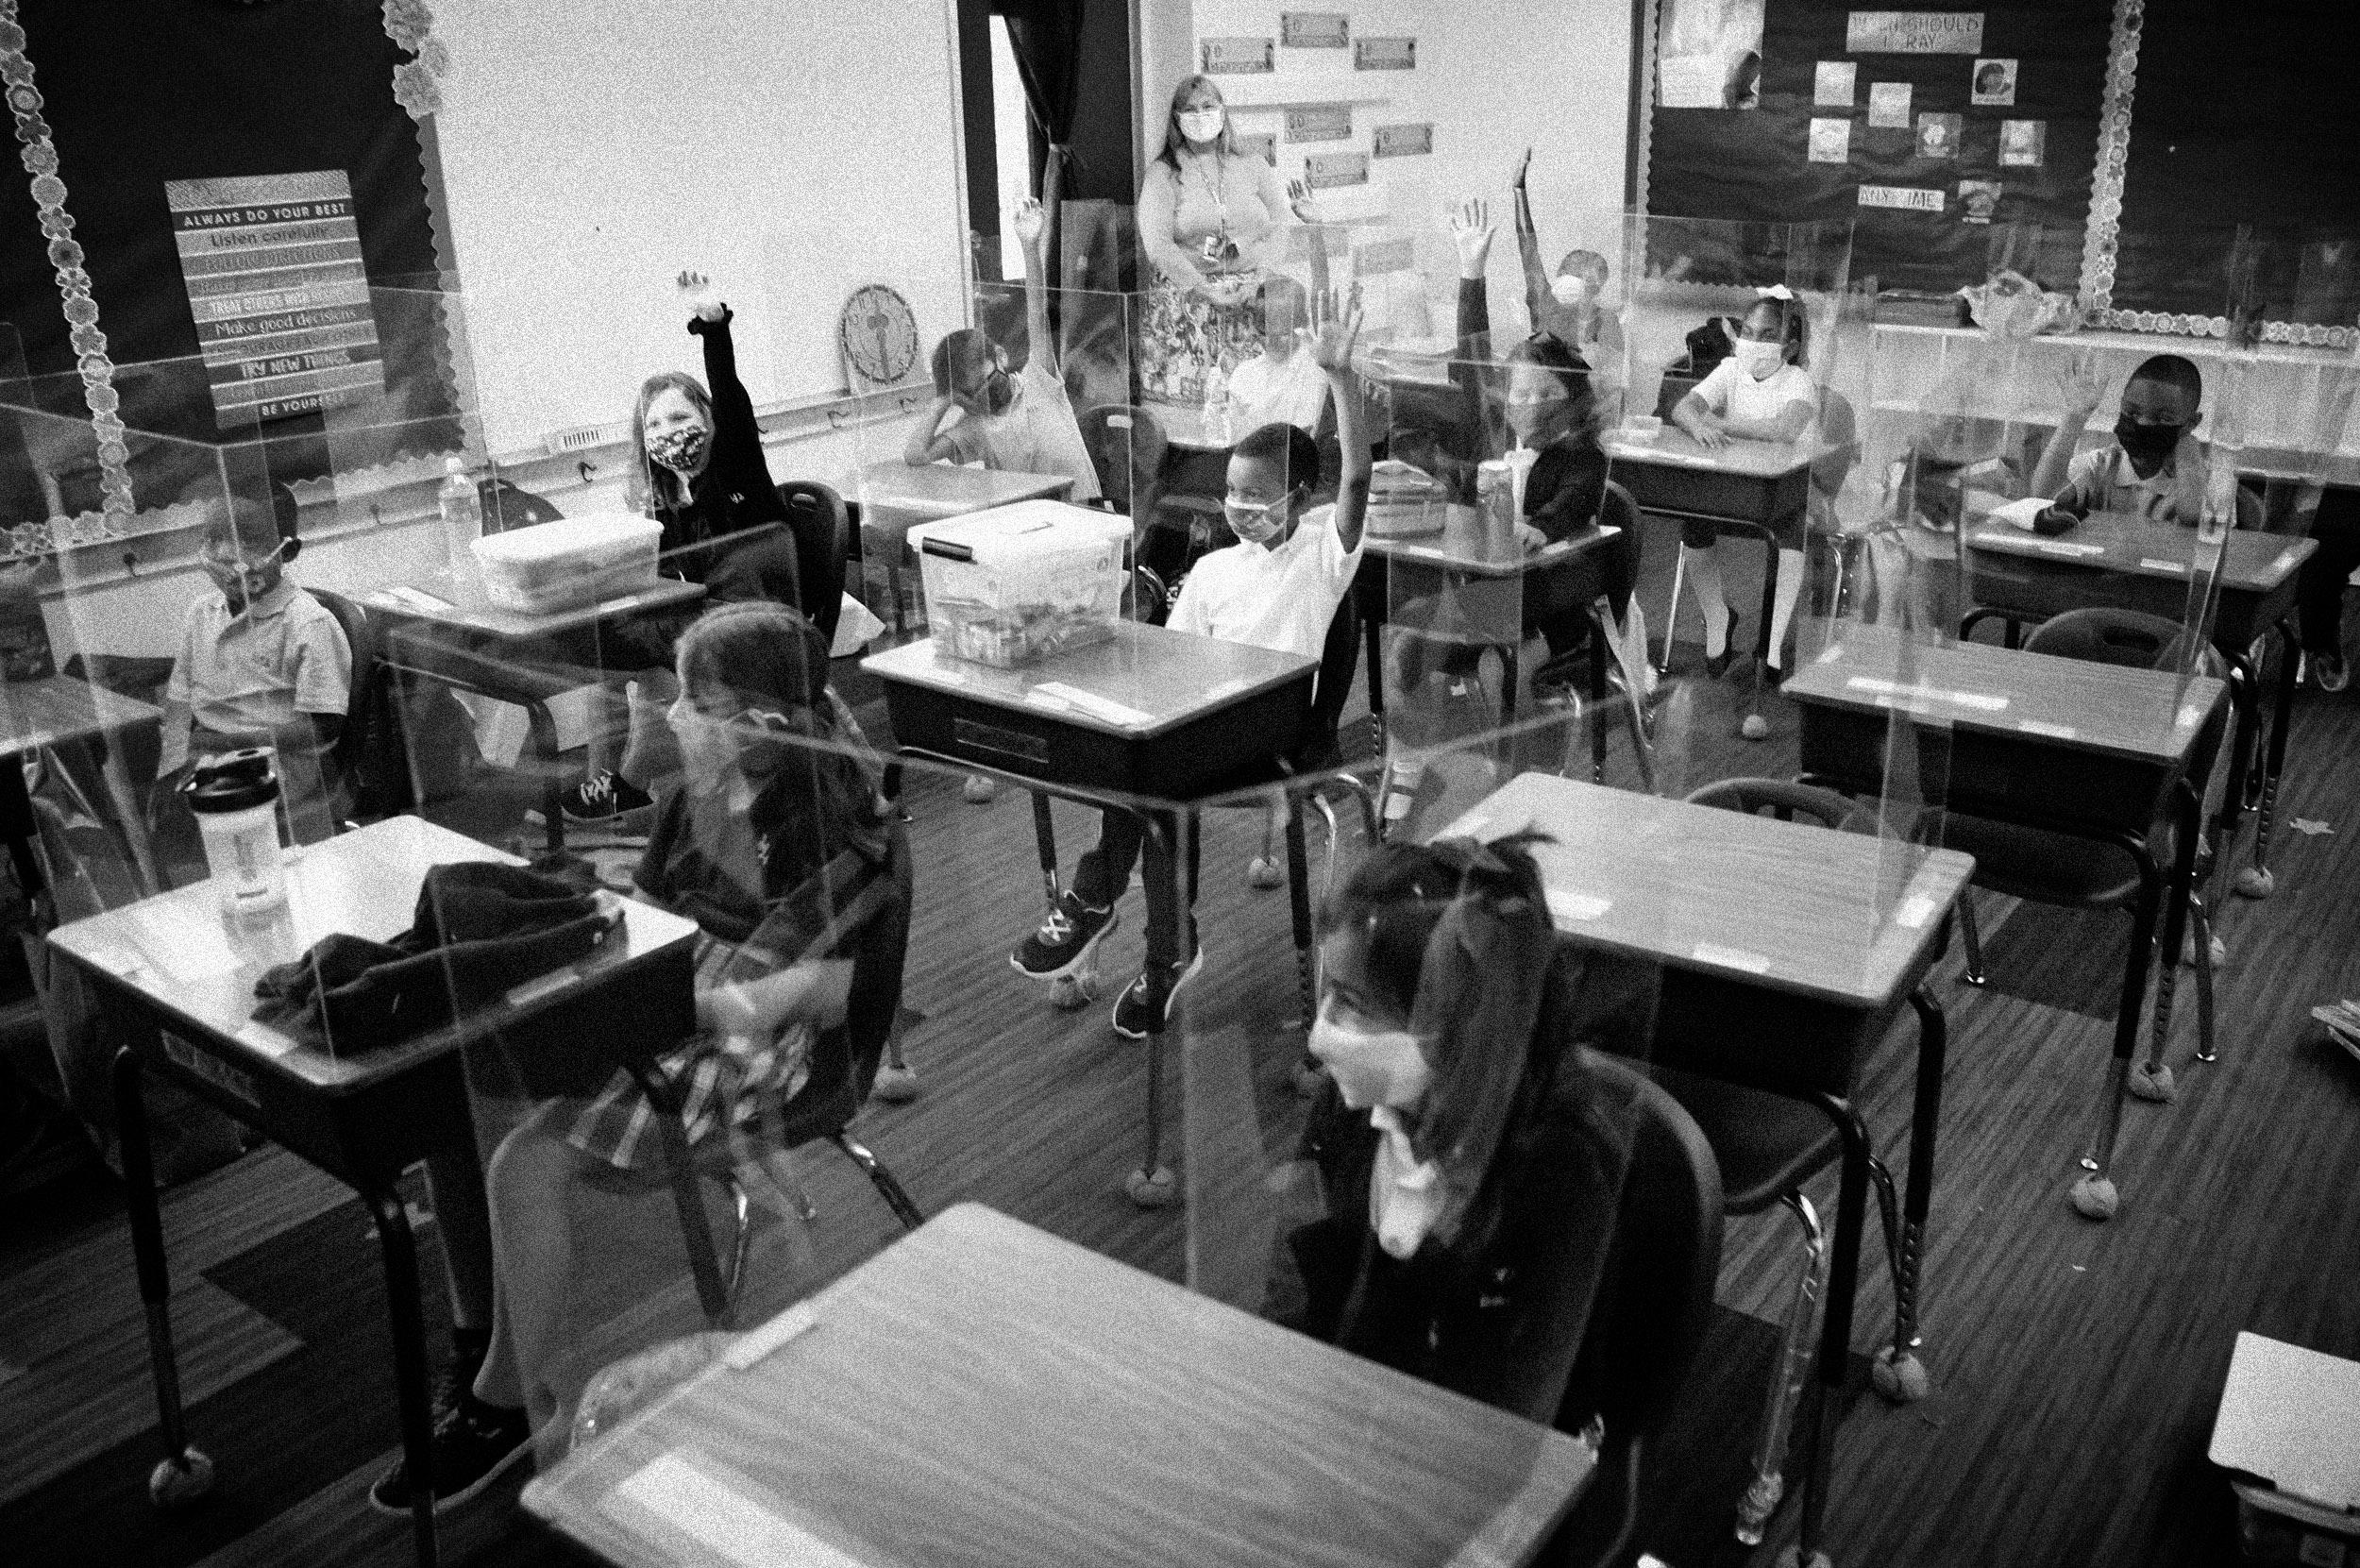 'It's impossible': Lack of Covid safeguards overwhelm school nurses